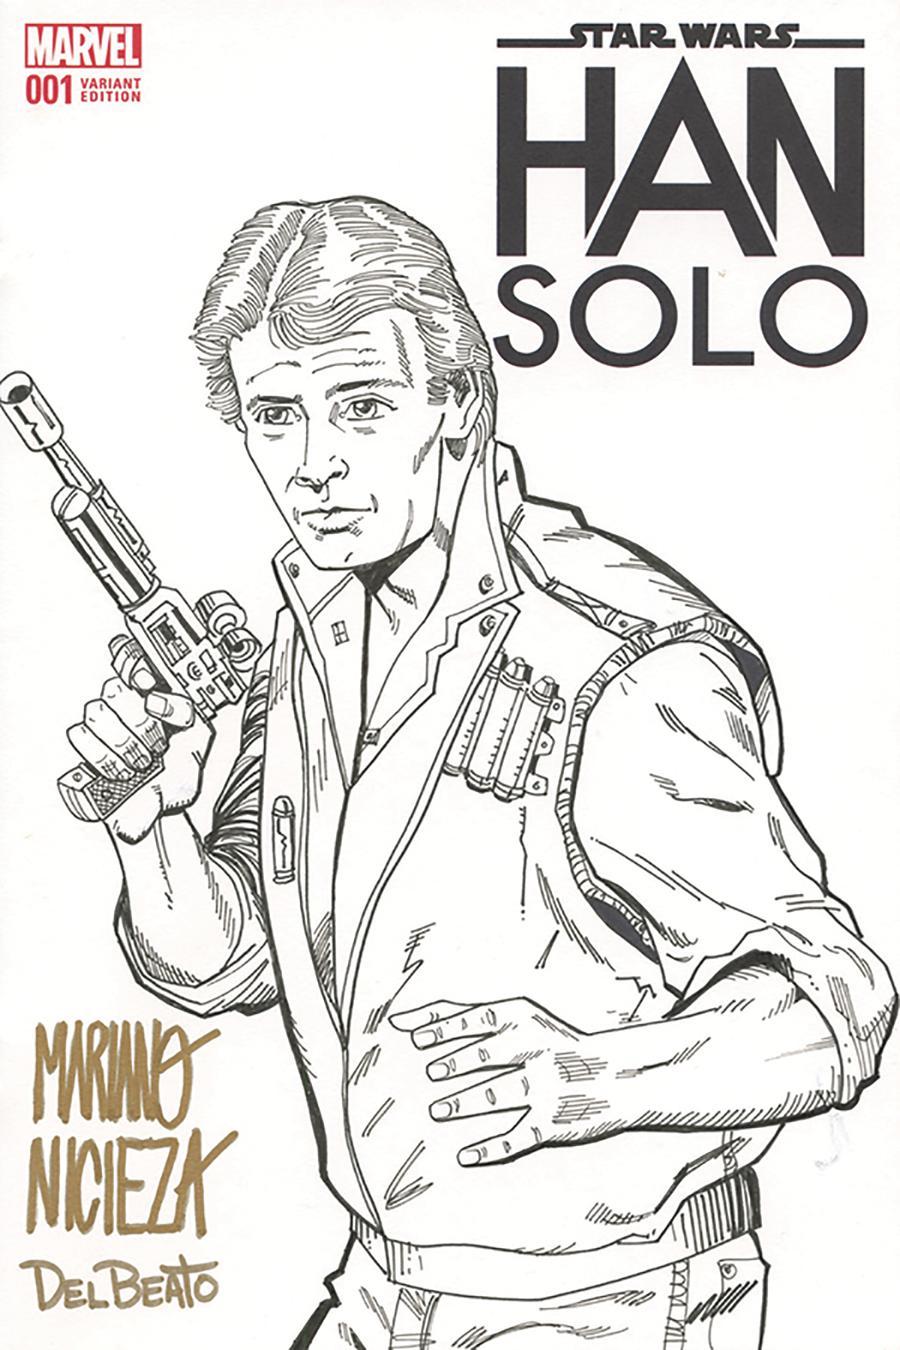 Star Wars Han Solo #1 Cover K DF Signed & Remarked With A Han Solo Sketch By Mariano Nicieza & Joe Delbeato